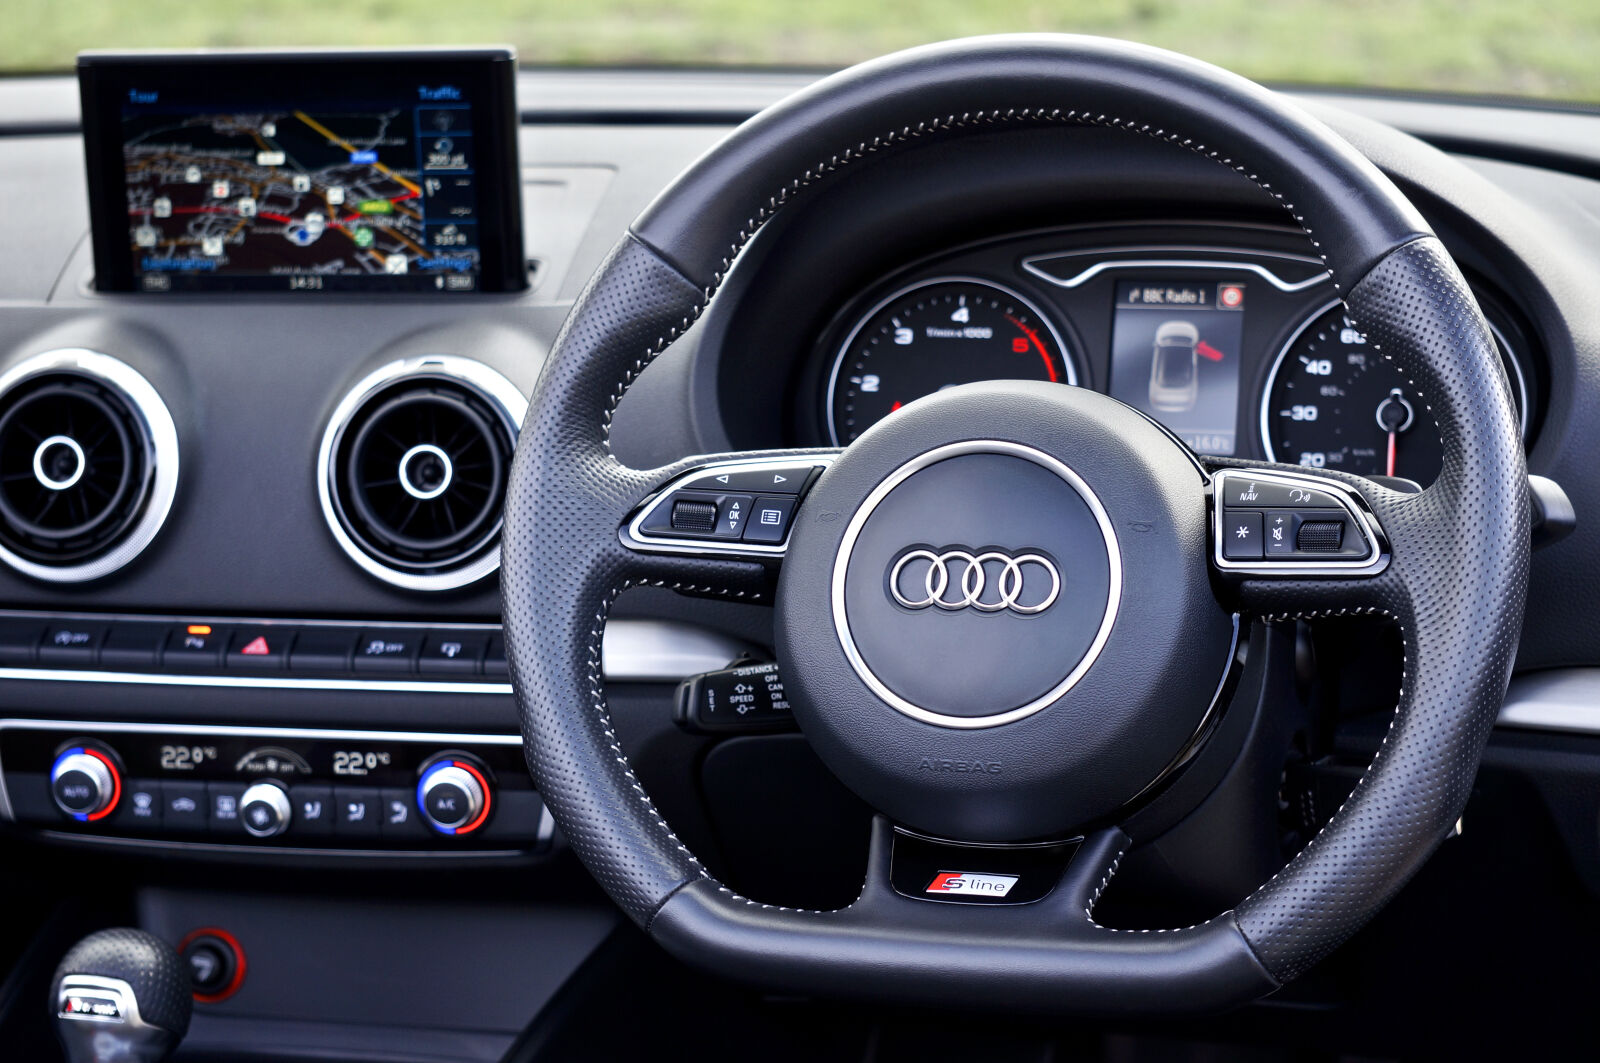 audi, car, interior, controls